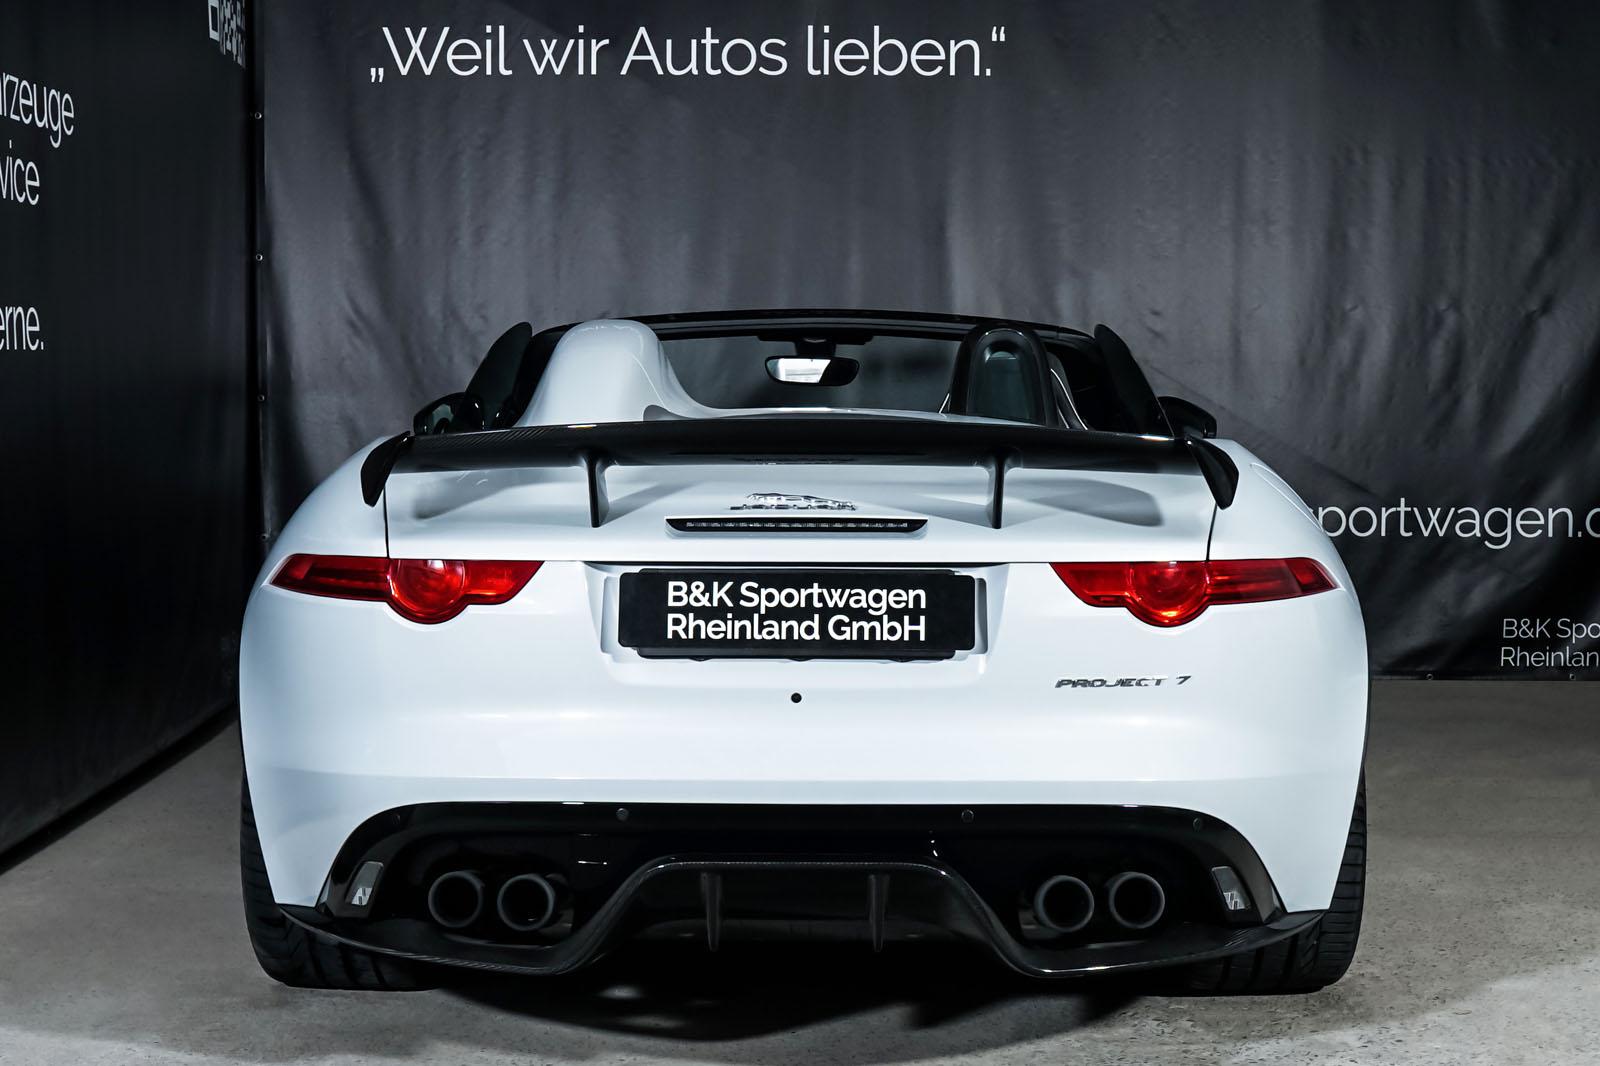 Jaguar_Project7_Weiss_Schwarz_JAG-0829_29_w